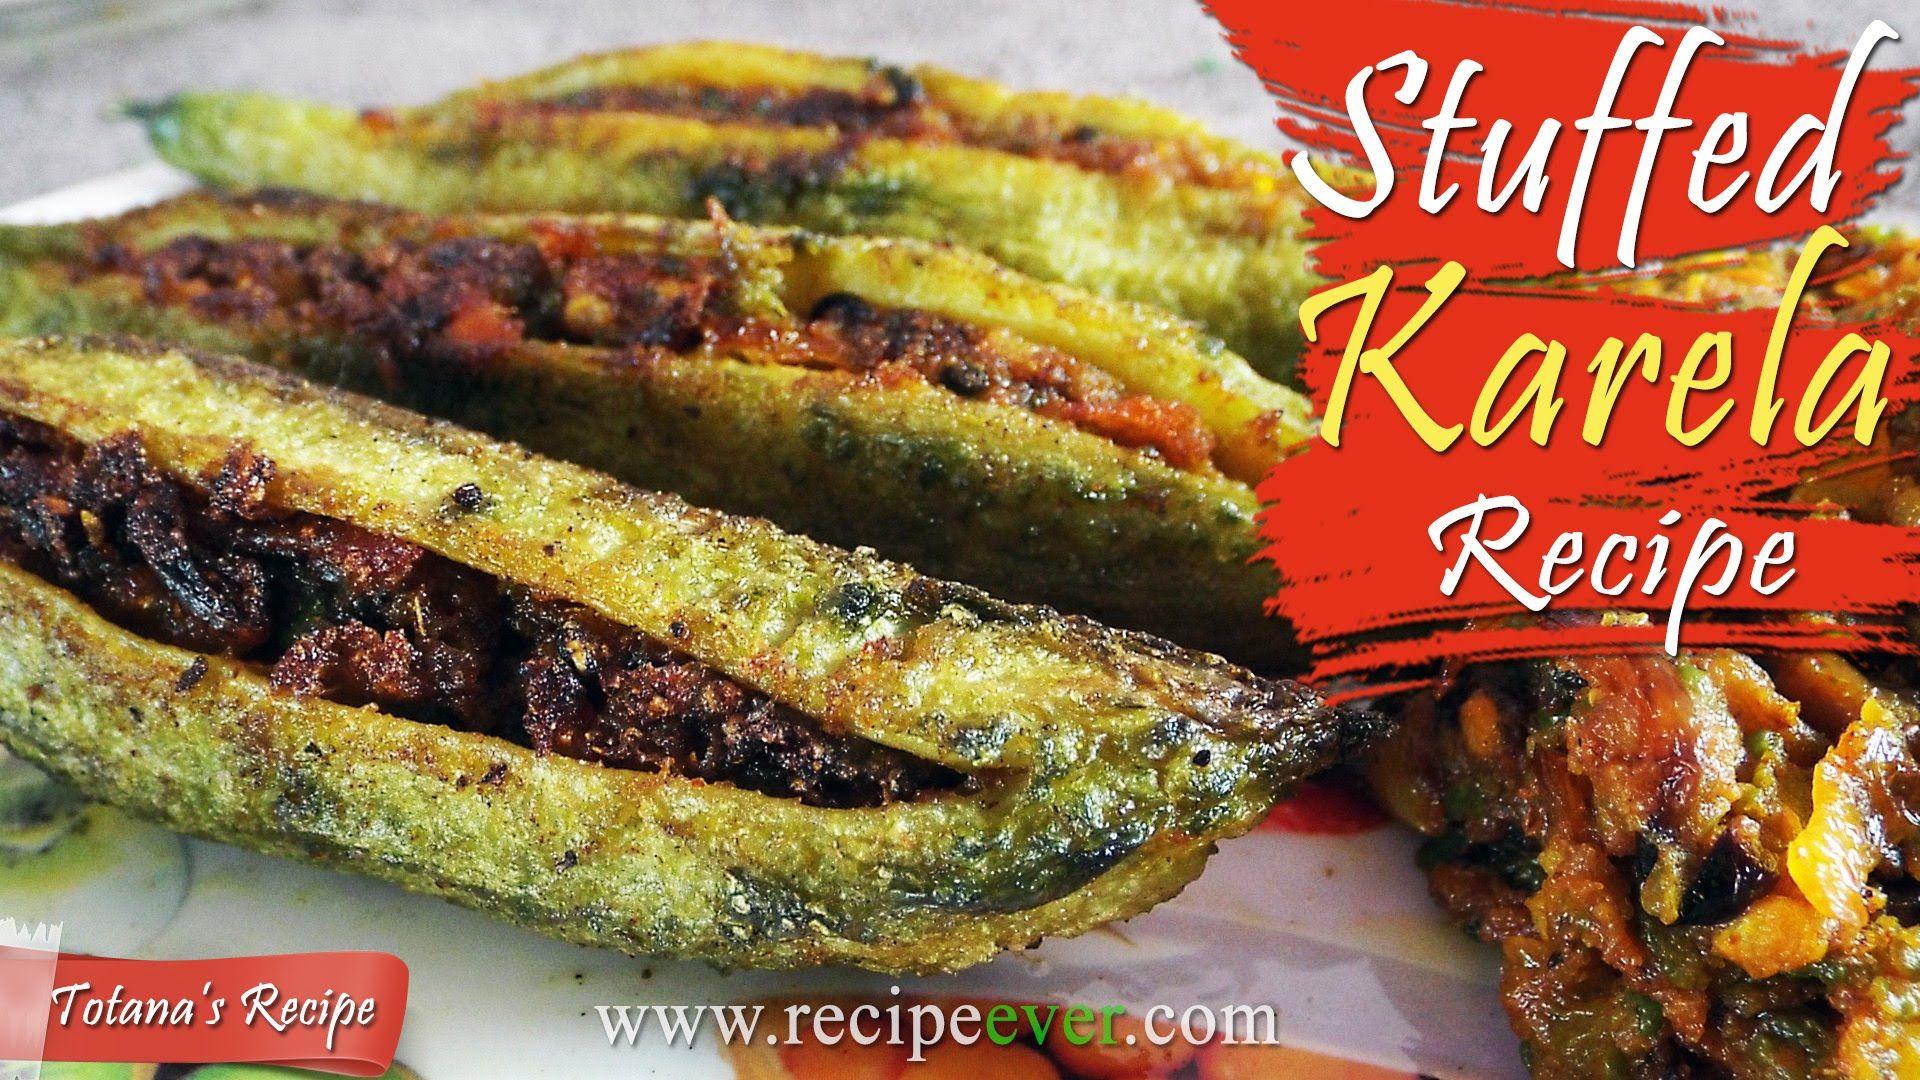 Stuffed korola recipe bengali food stuffed karela bangla recipe food stuffed korola recipe bengali forumfinder Gallery